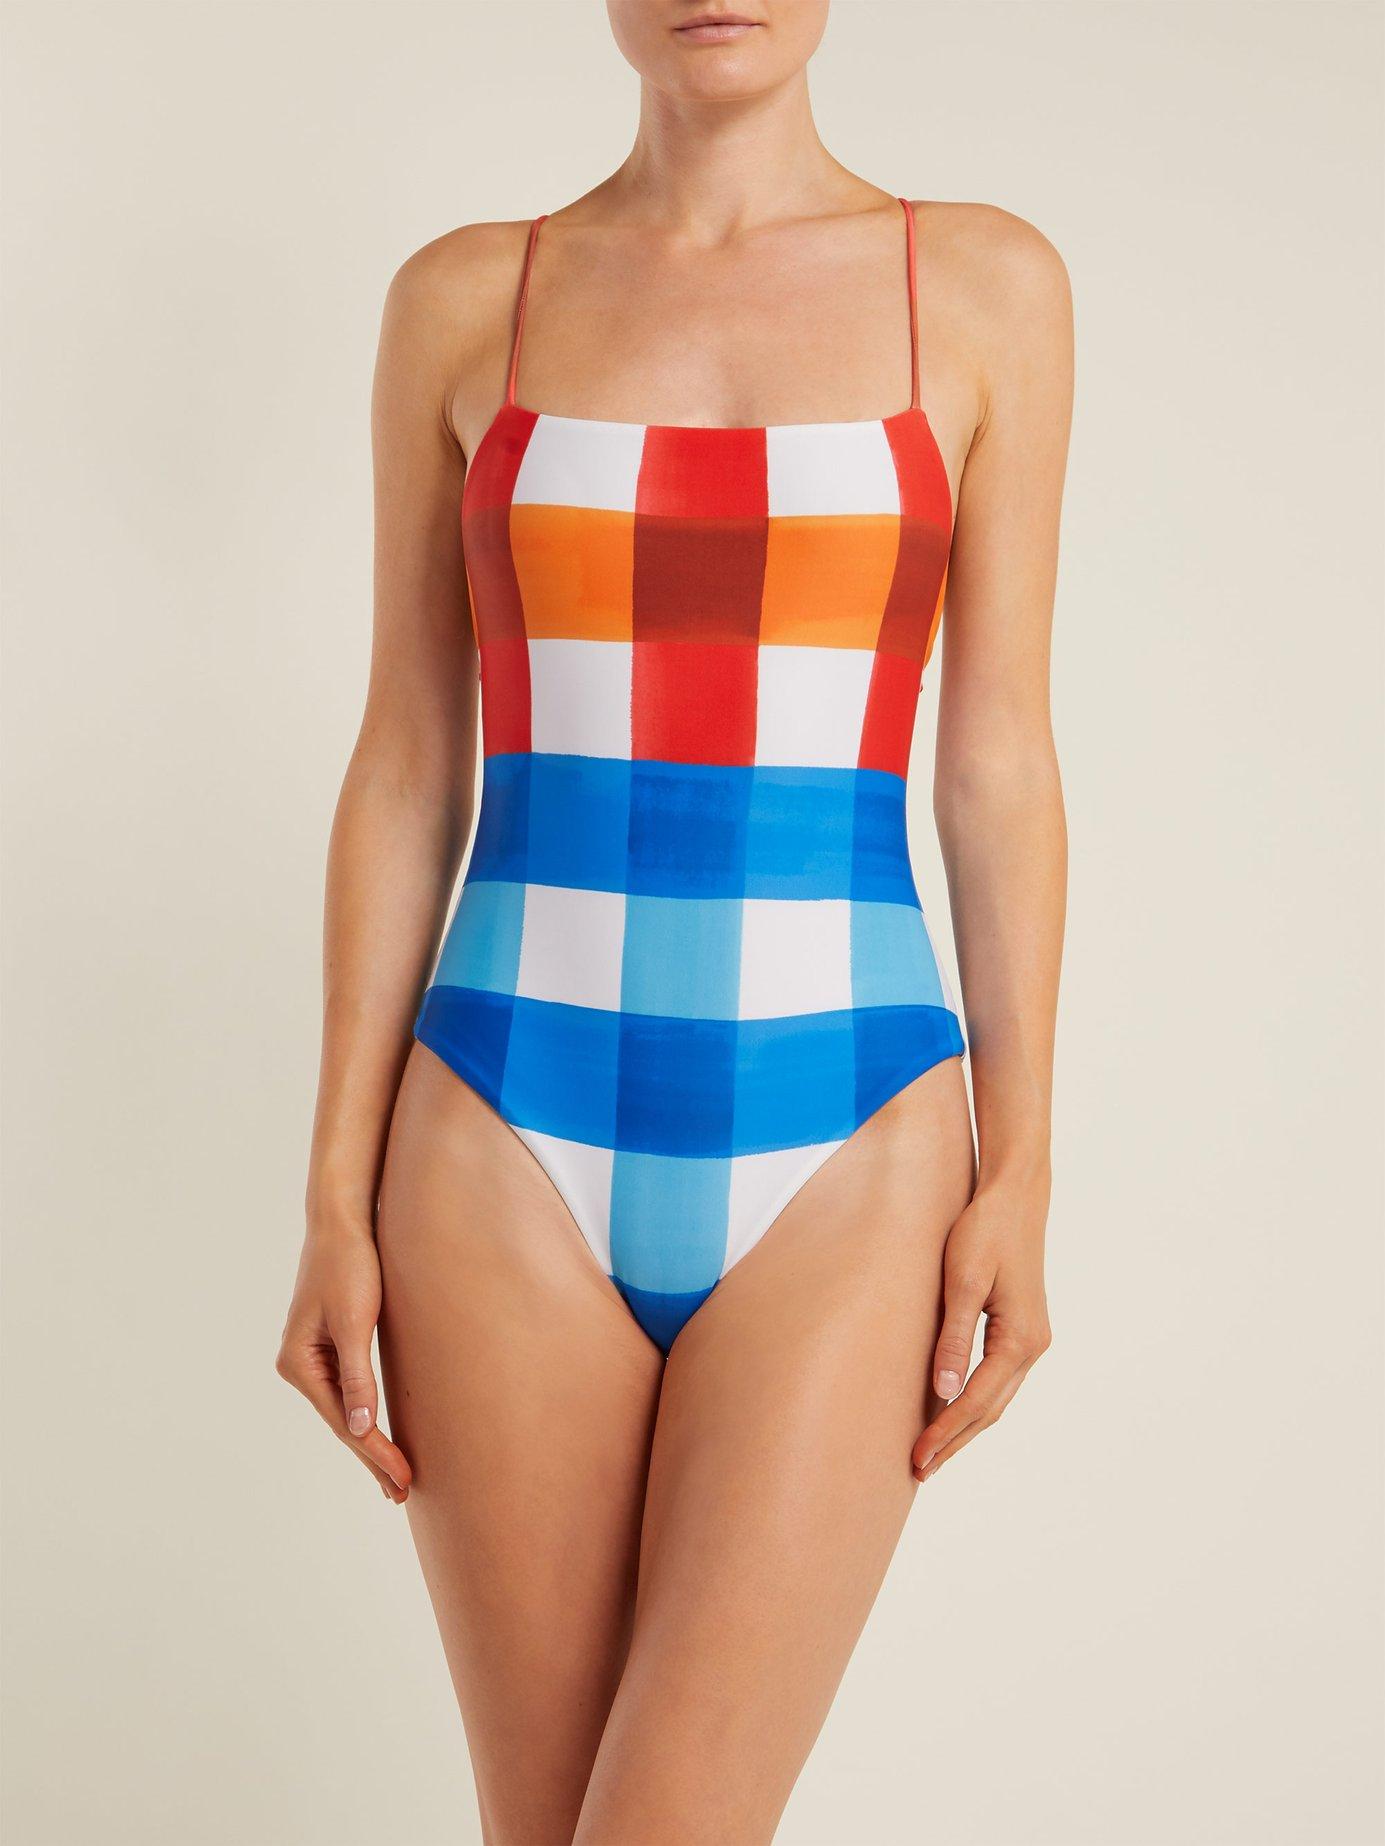 Olympia dejeuner plaid-print swimsuit by Mara Hoffman